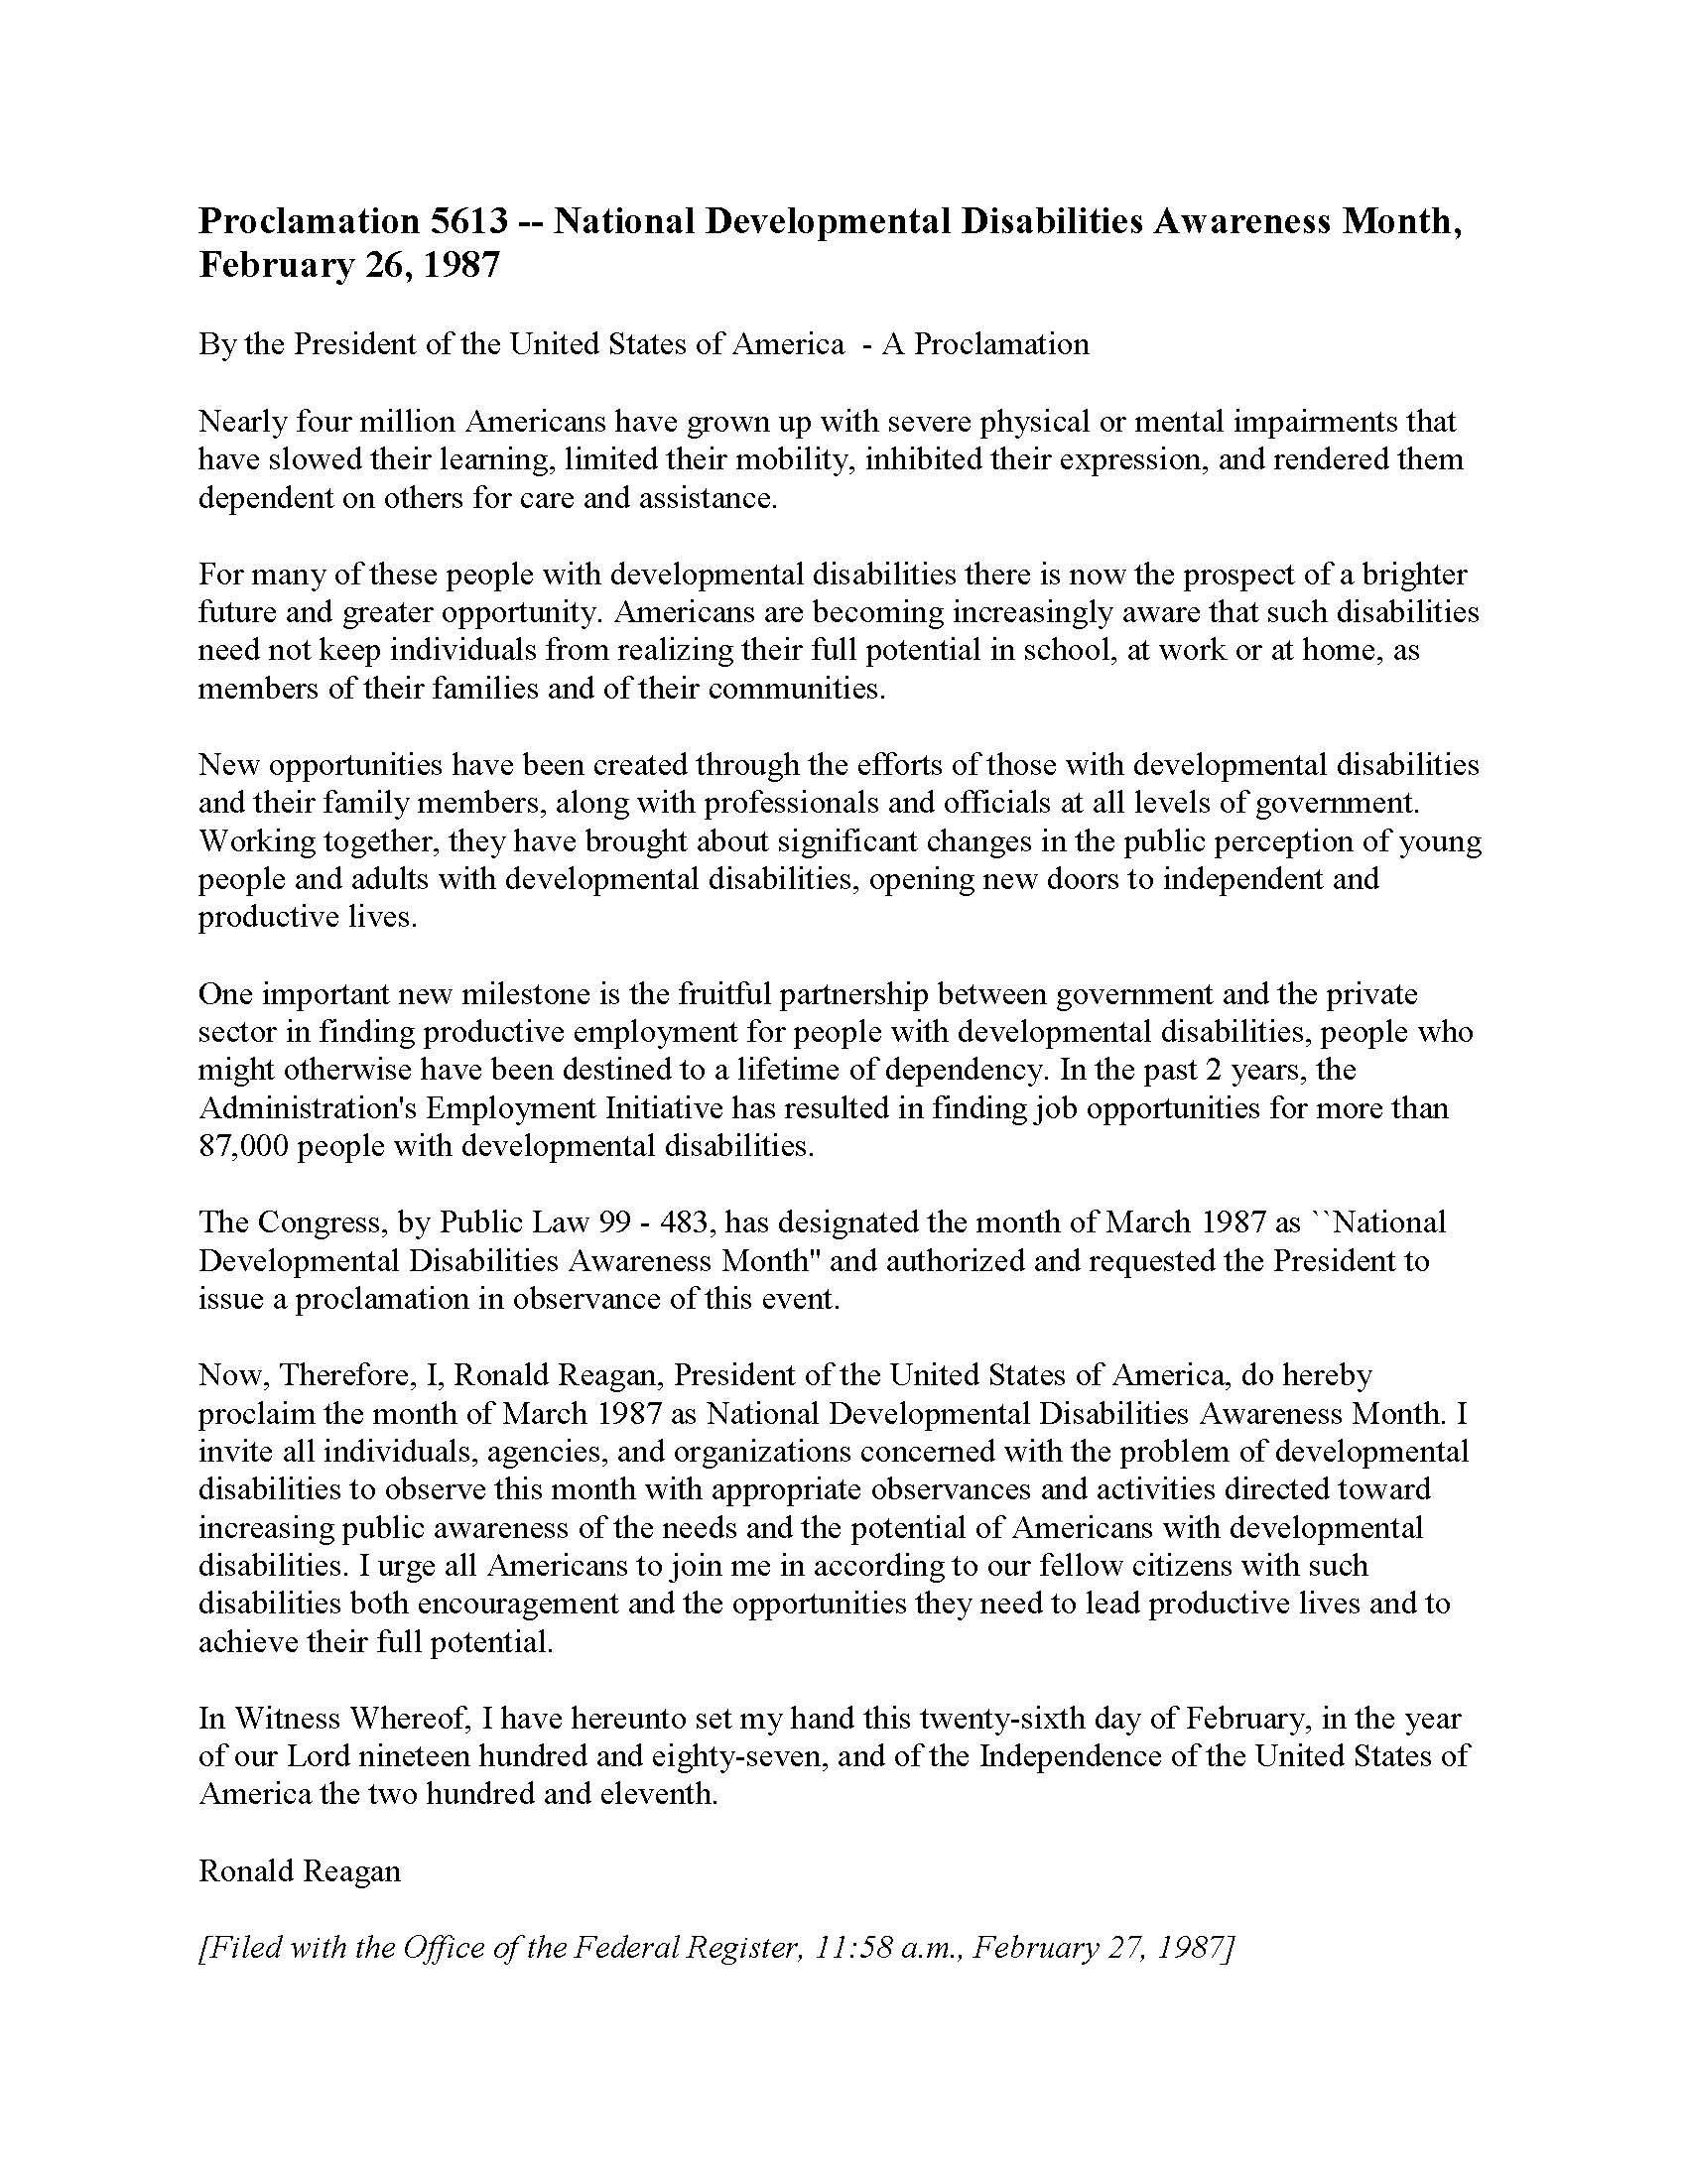 Original Proclamation February 26, 1987 - National Developmental Disabilities Awareness Month